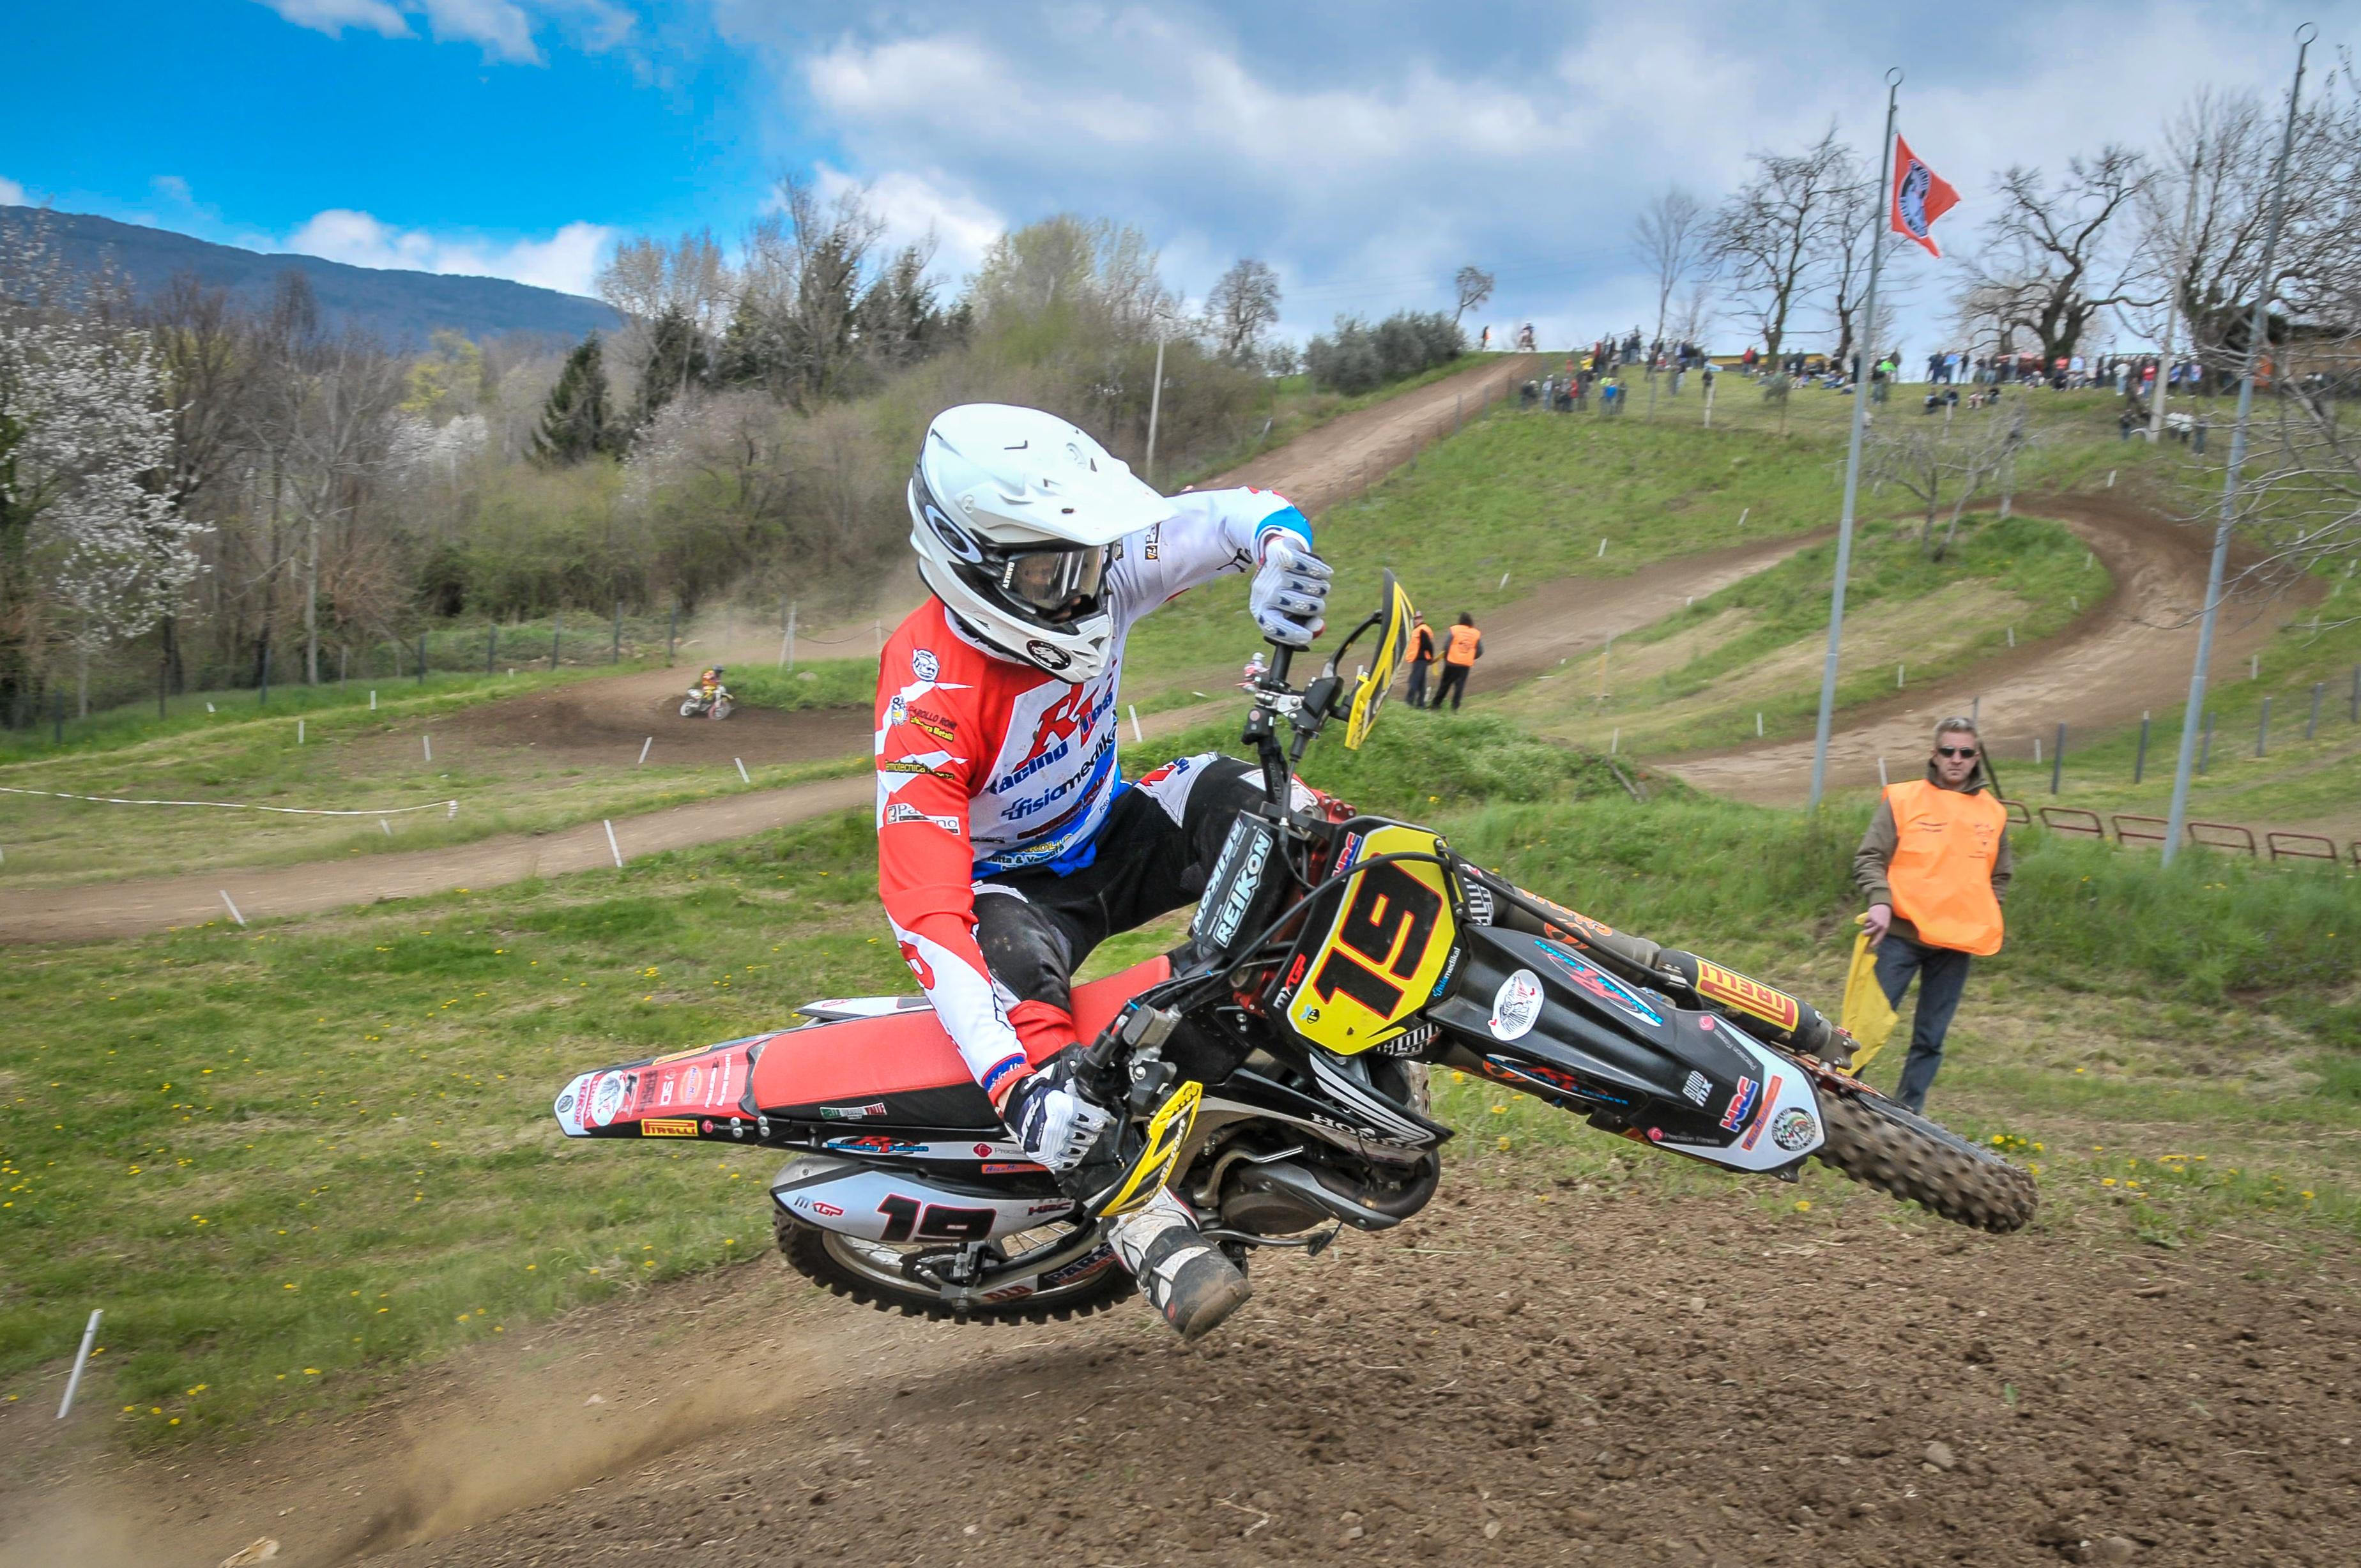 Foto pista motocross Fara5